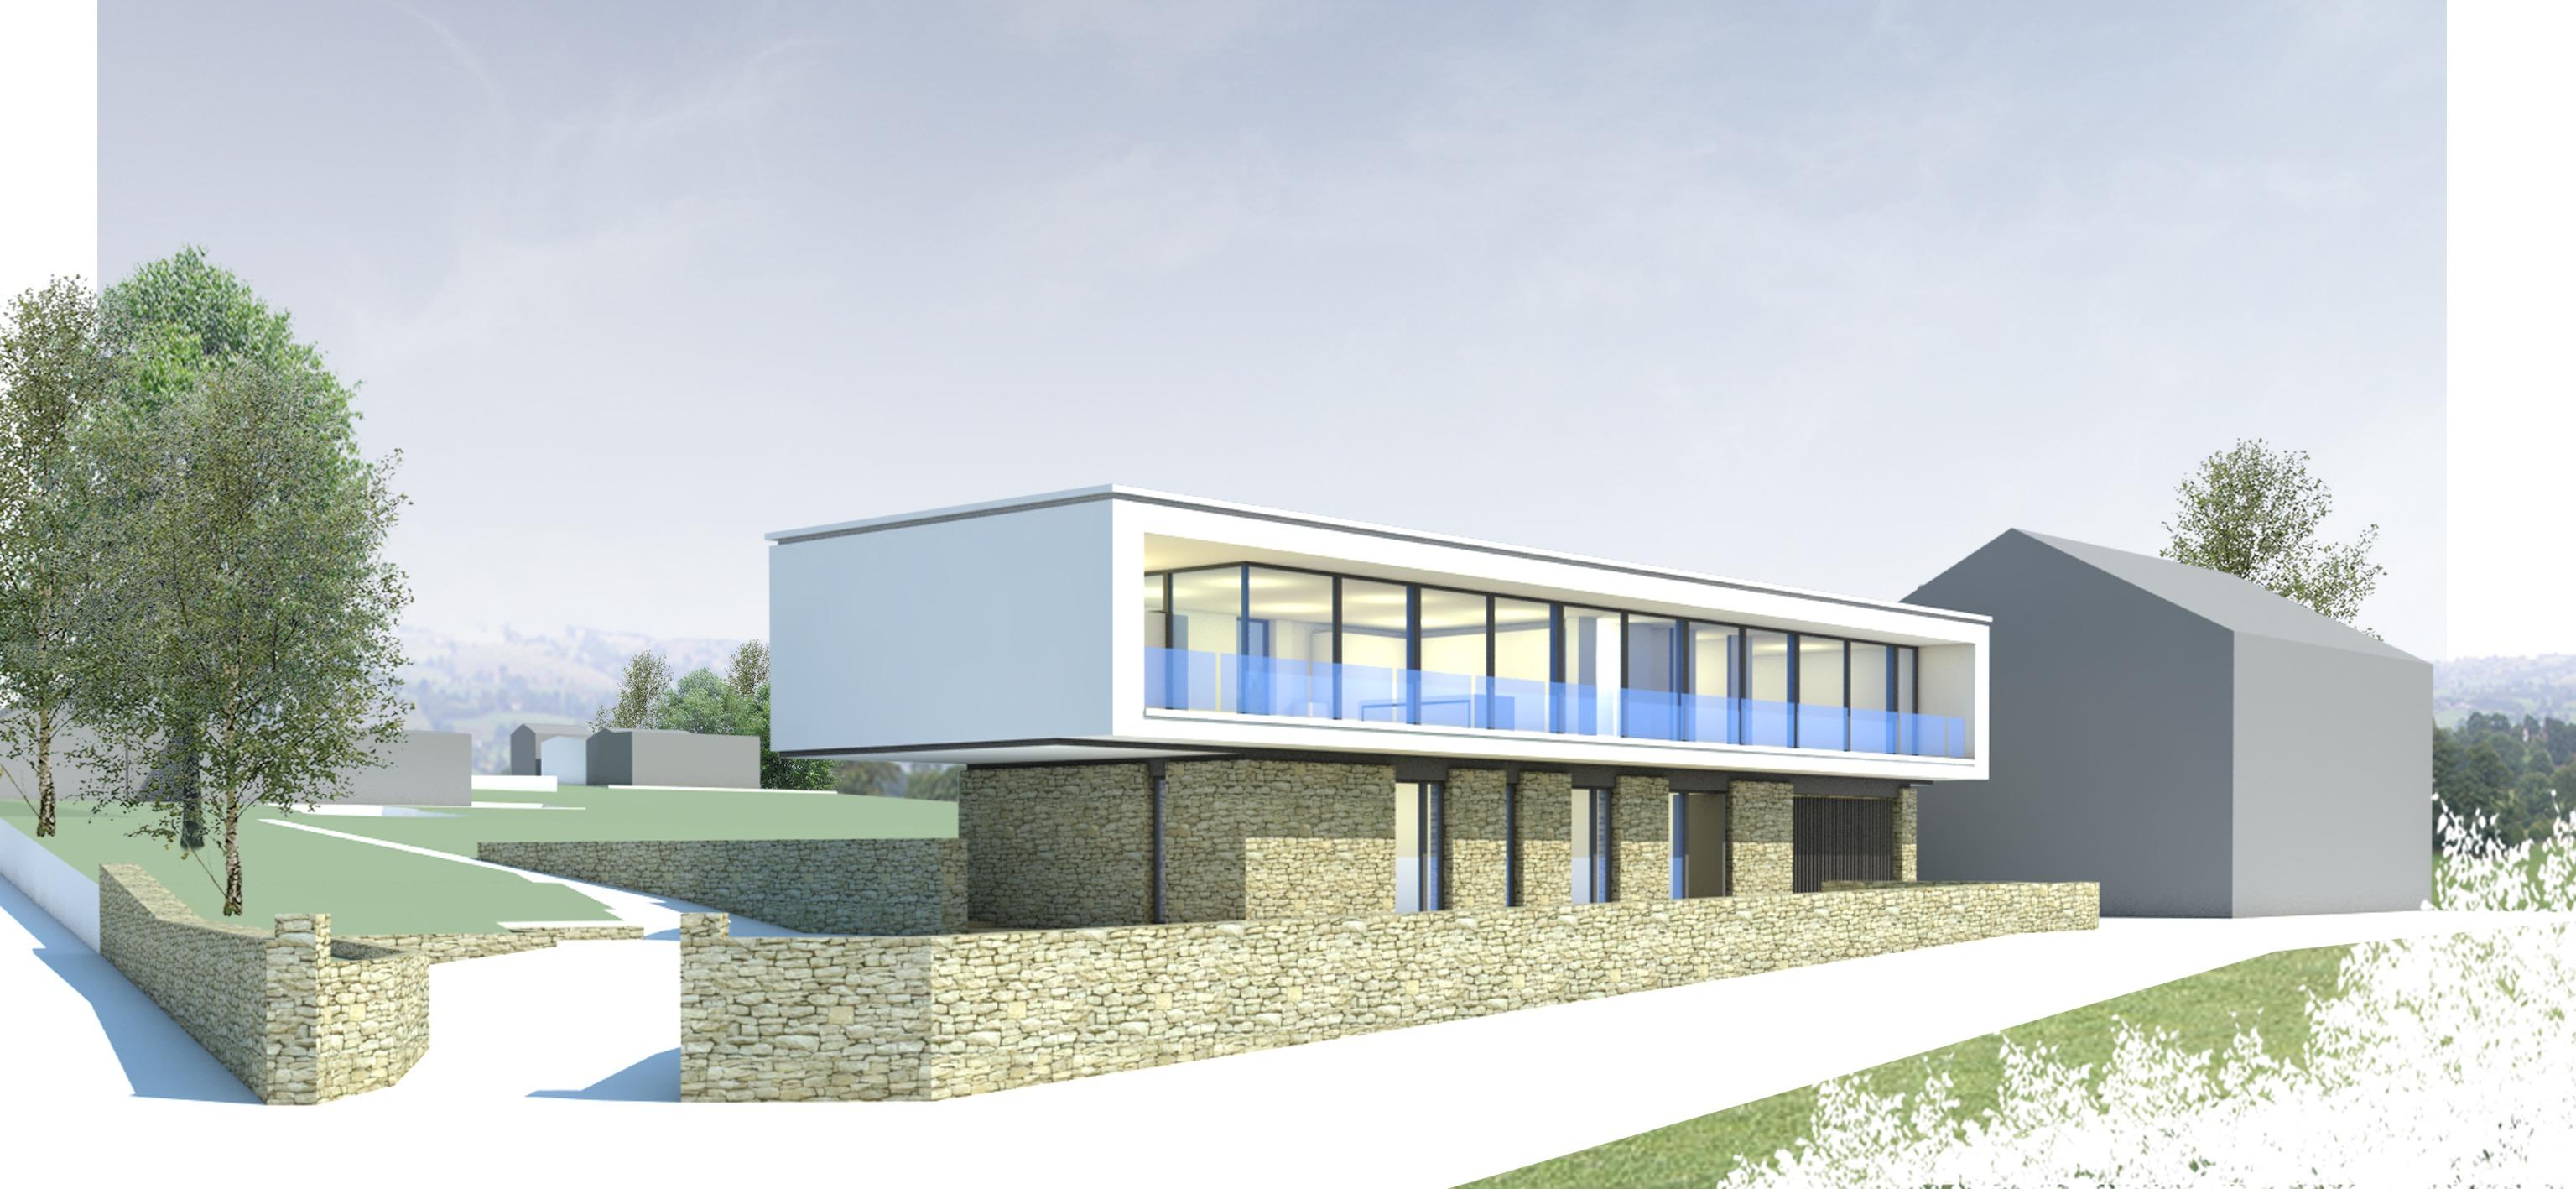 Stanton Andrews House Design No 2